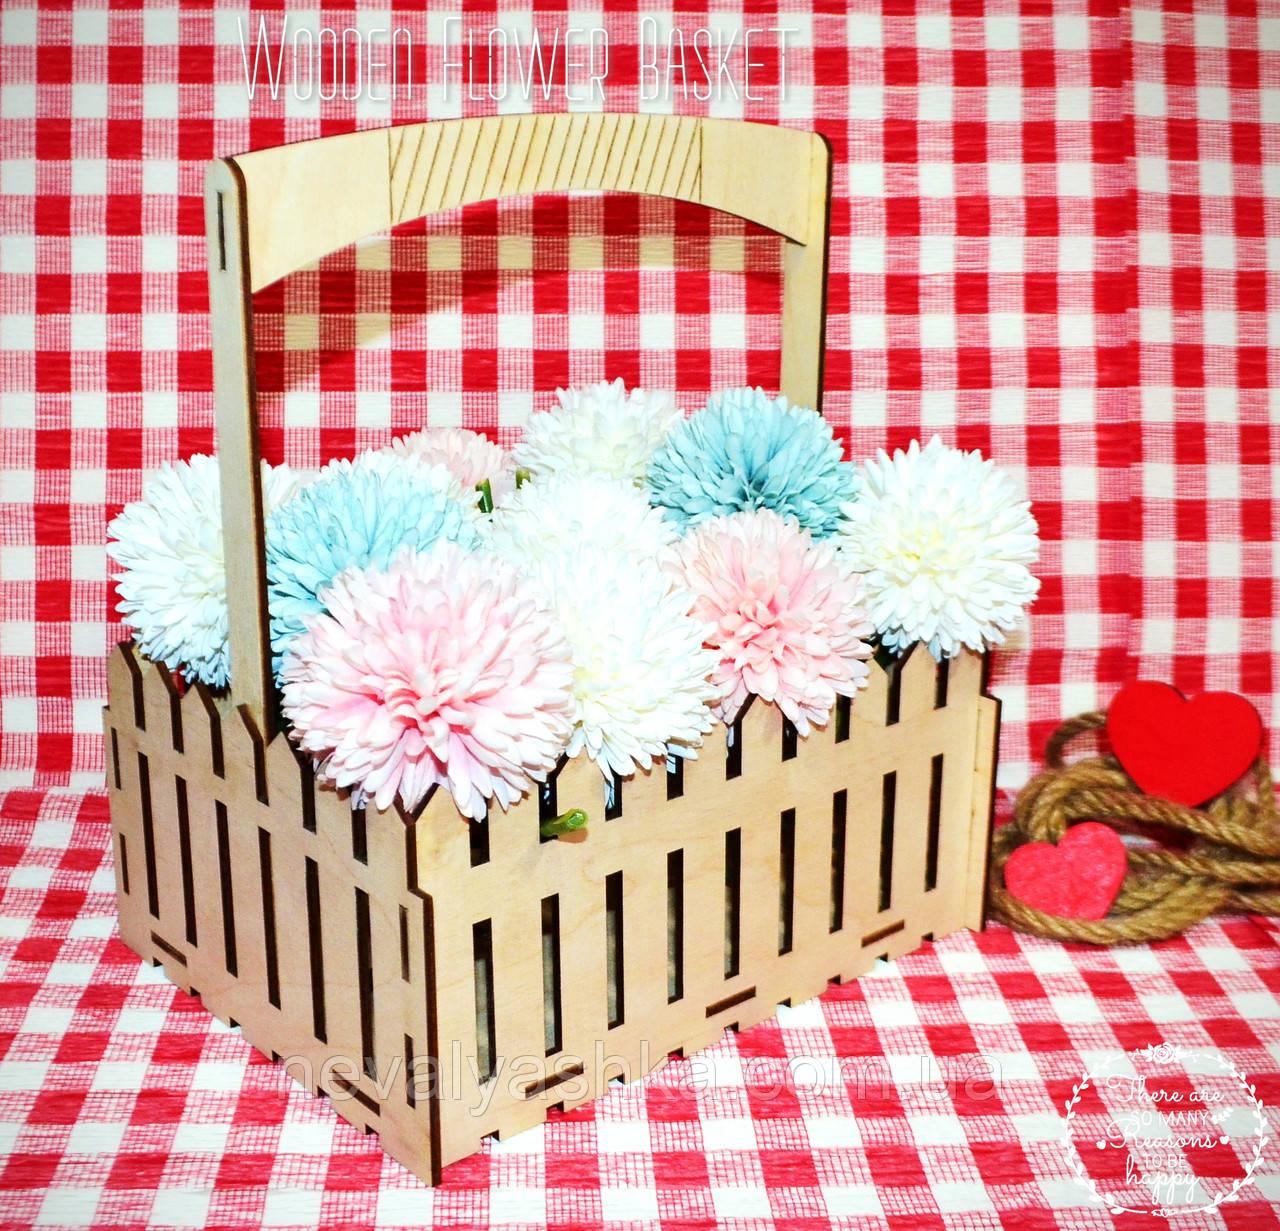 Декоративная Деревянная Корзинка Большая для оформления цветов букетов дерев'яна корзина для квітів